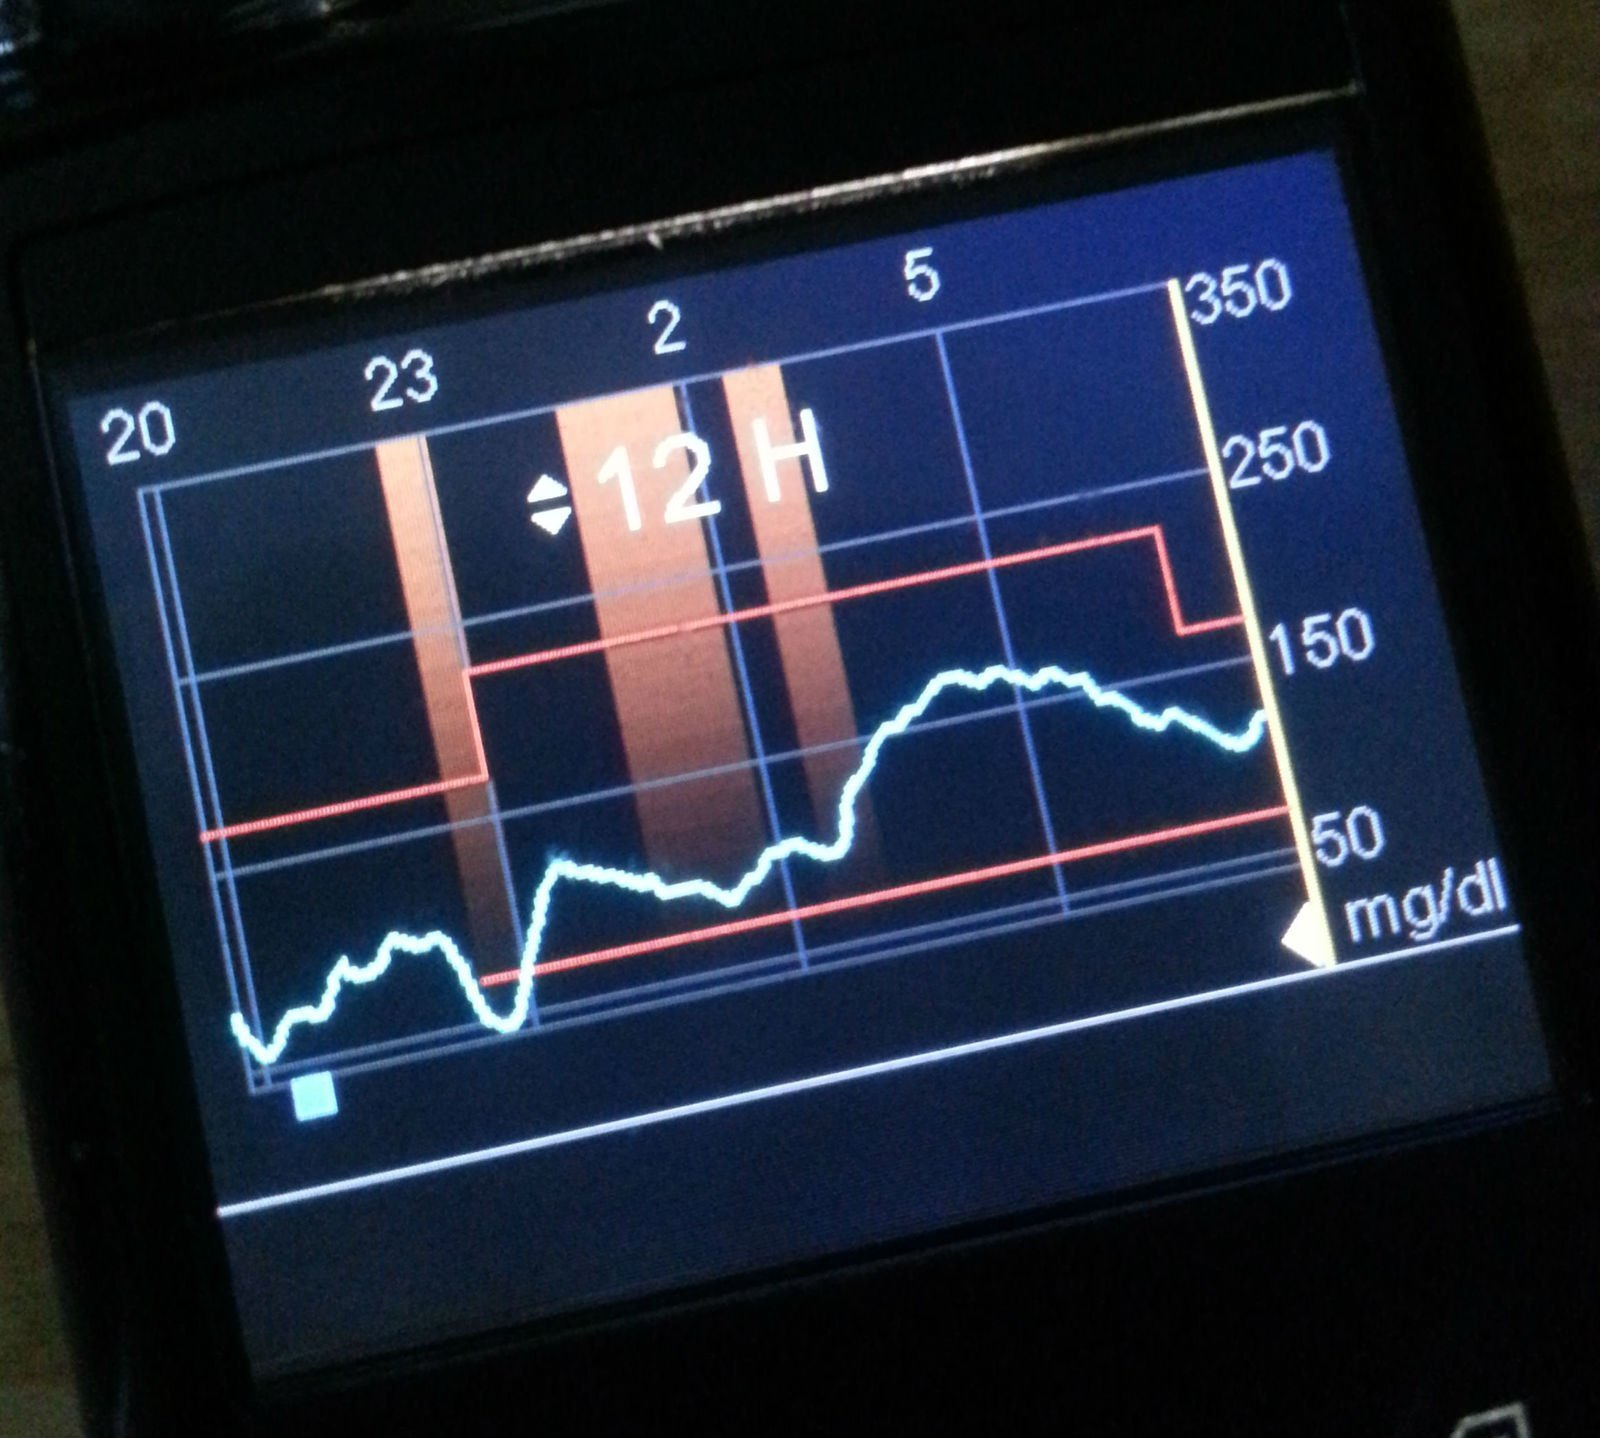 pompe insuline 640g de medtronic mesure du glucose en continu. Black Bedroom Furniture Sets. Home Design Ideas